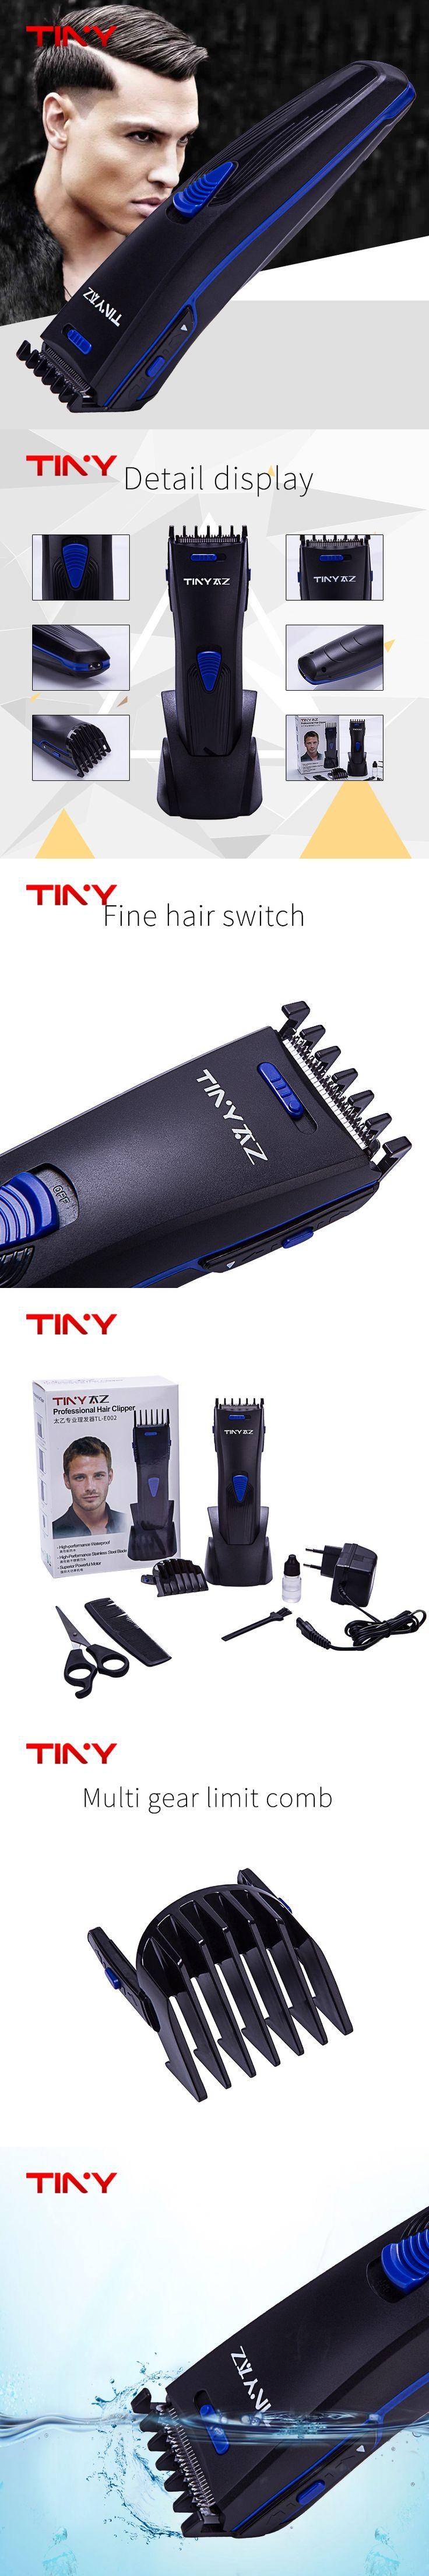 TINY Electric Men Clipper Professional Micro Razor Men Beard hair trimmer Hair Removal Hair cutting machine